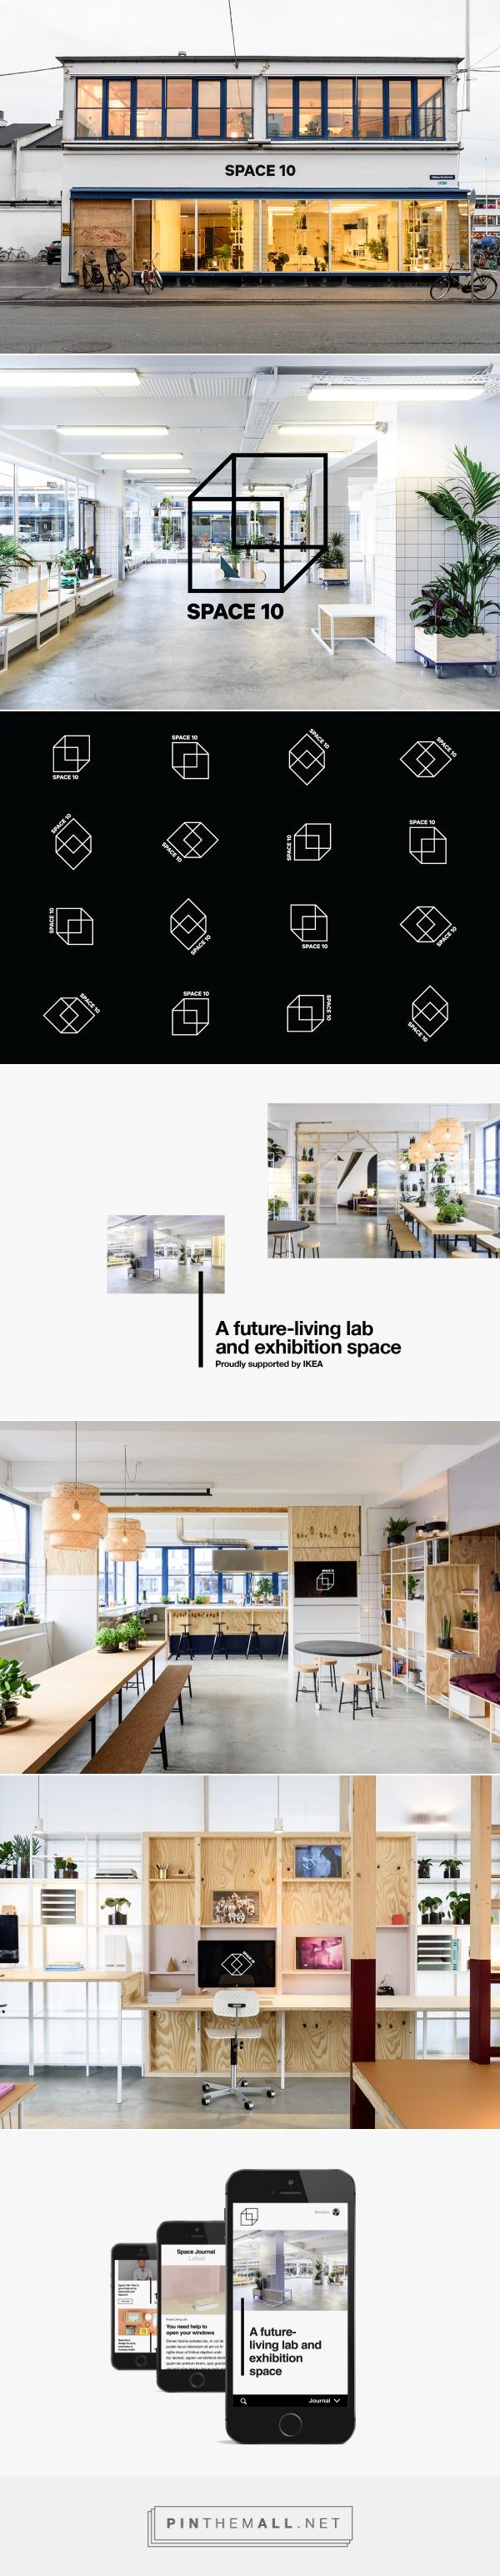 Visual & Brand Identity - Space10, Denmark on Behance